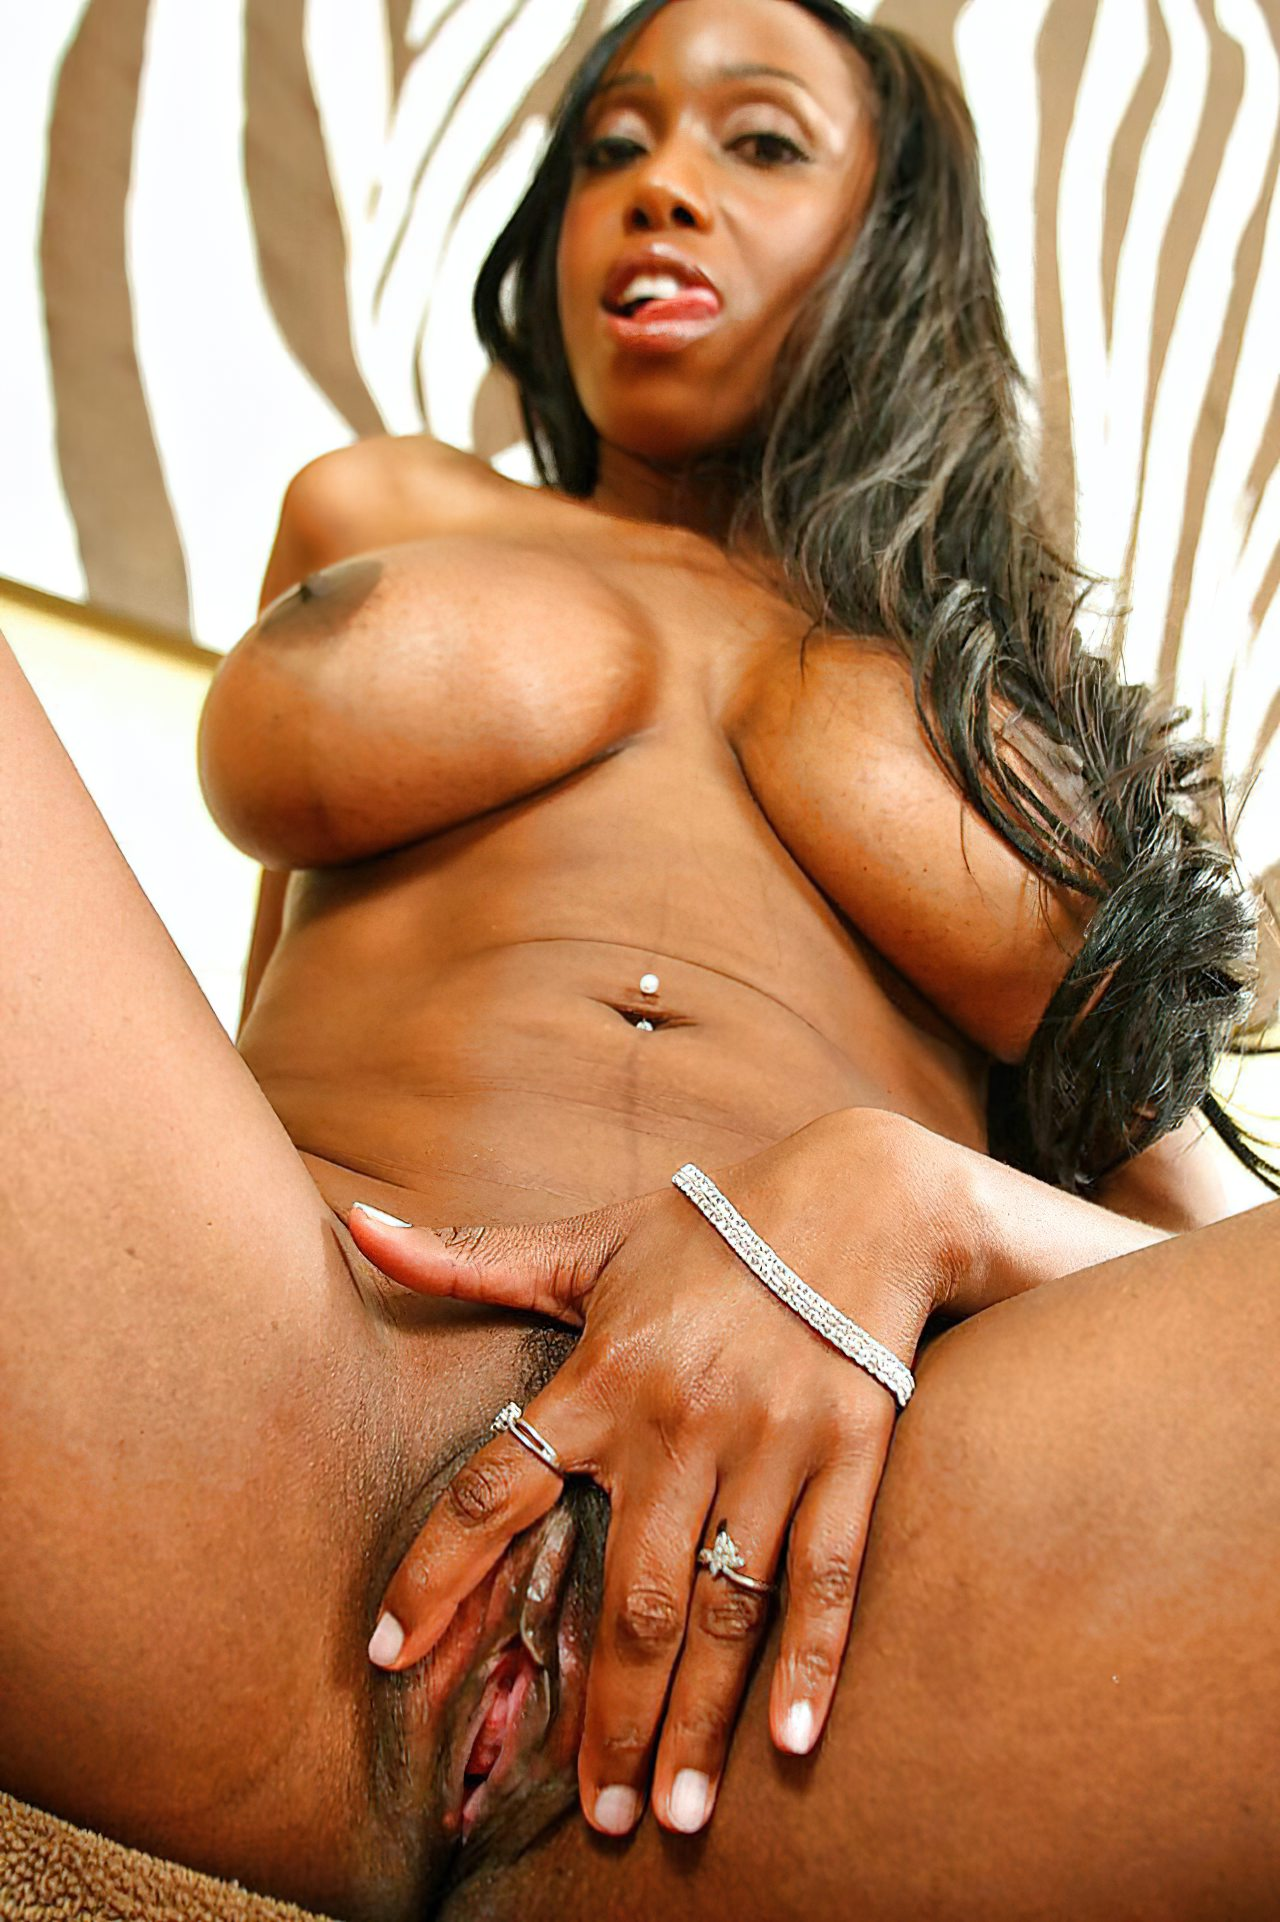 Mulher Gostosa (40)